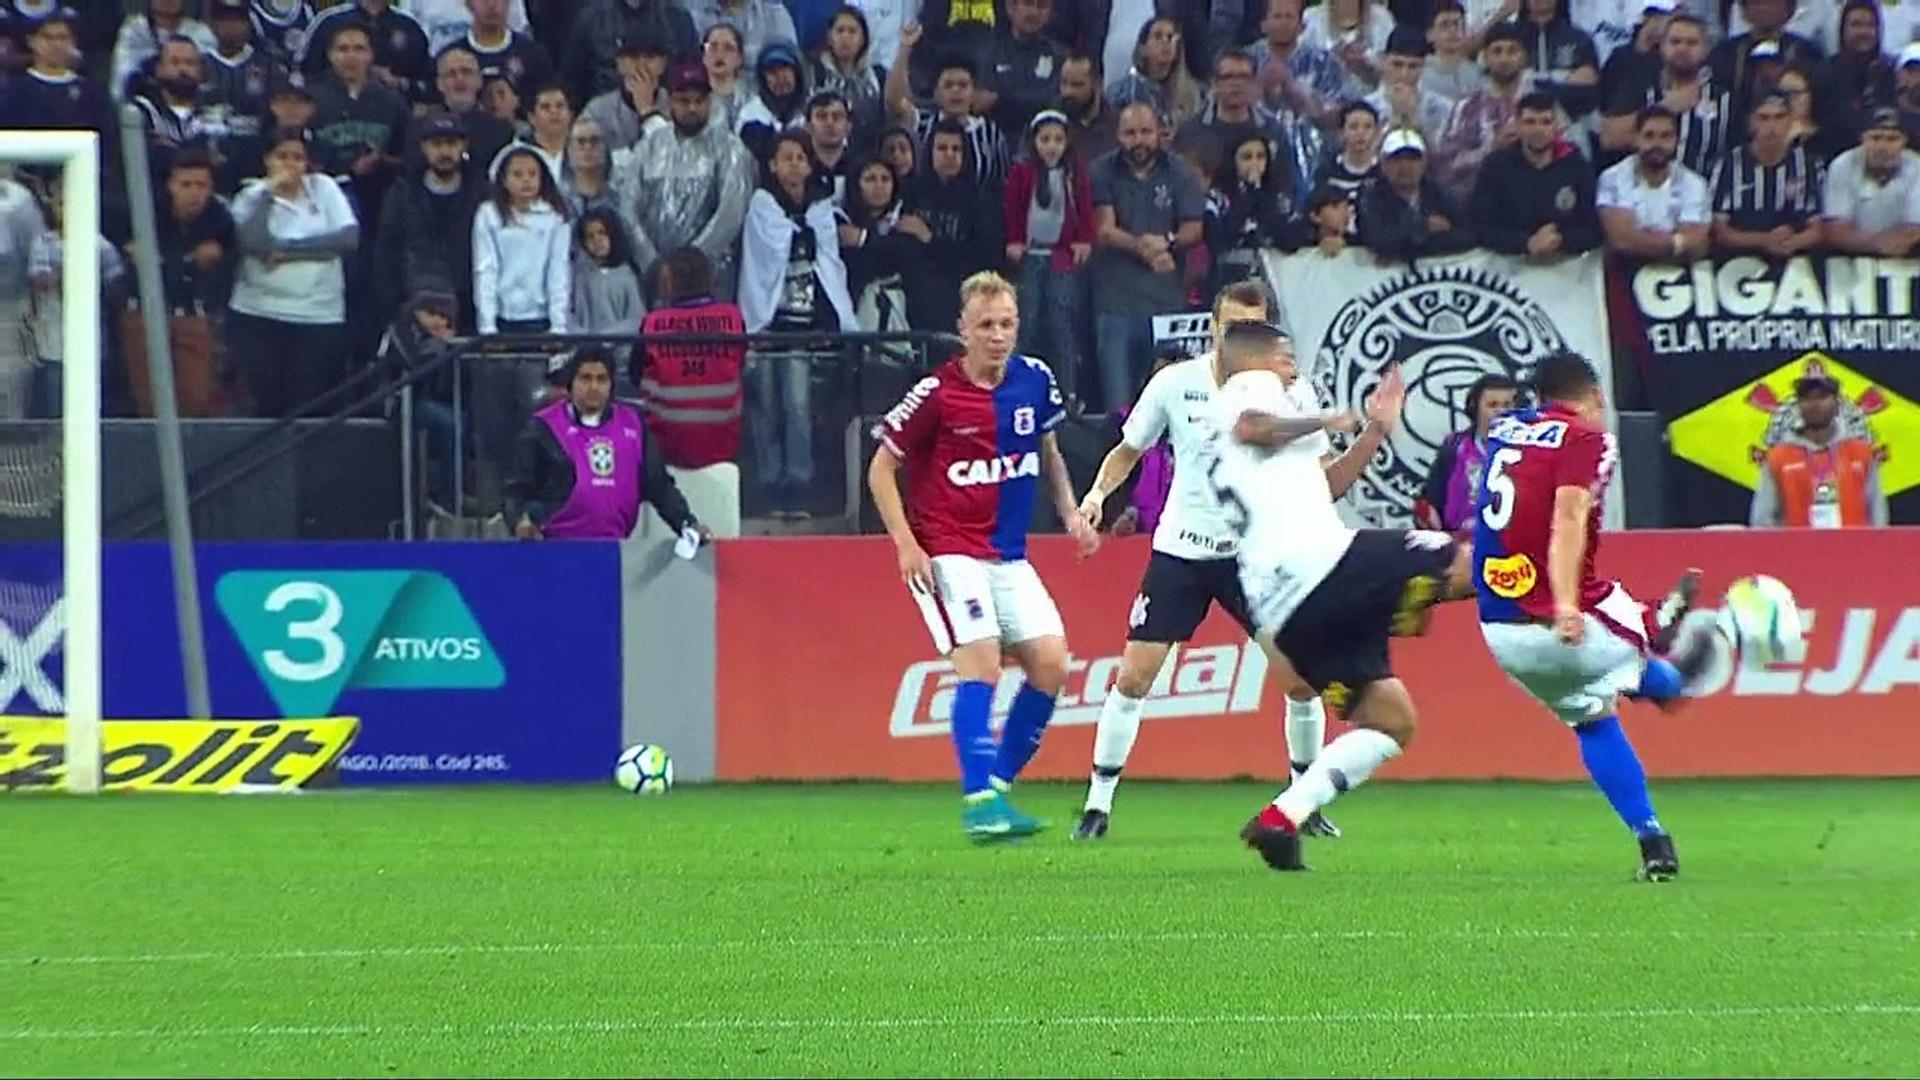 [MEL****S MOMENTOS] Corinthians 1 x 0 Paraná - Série A 2018